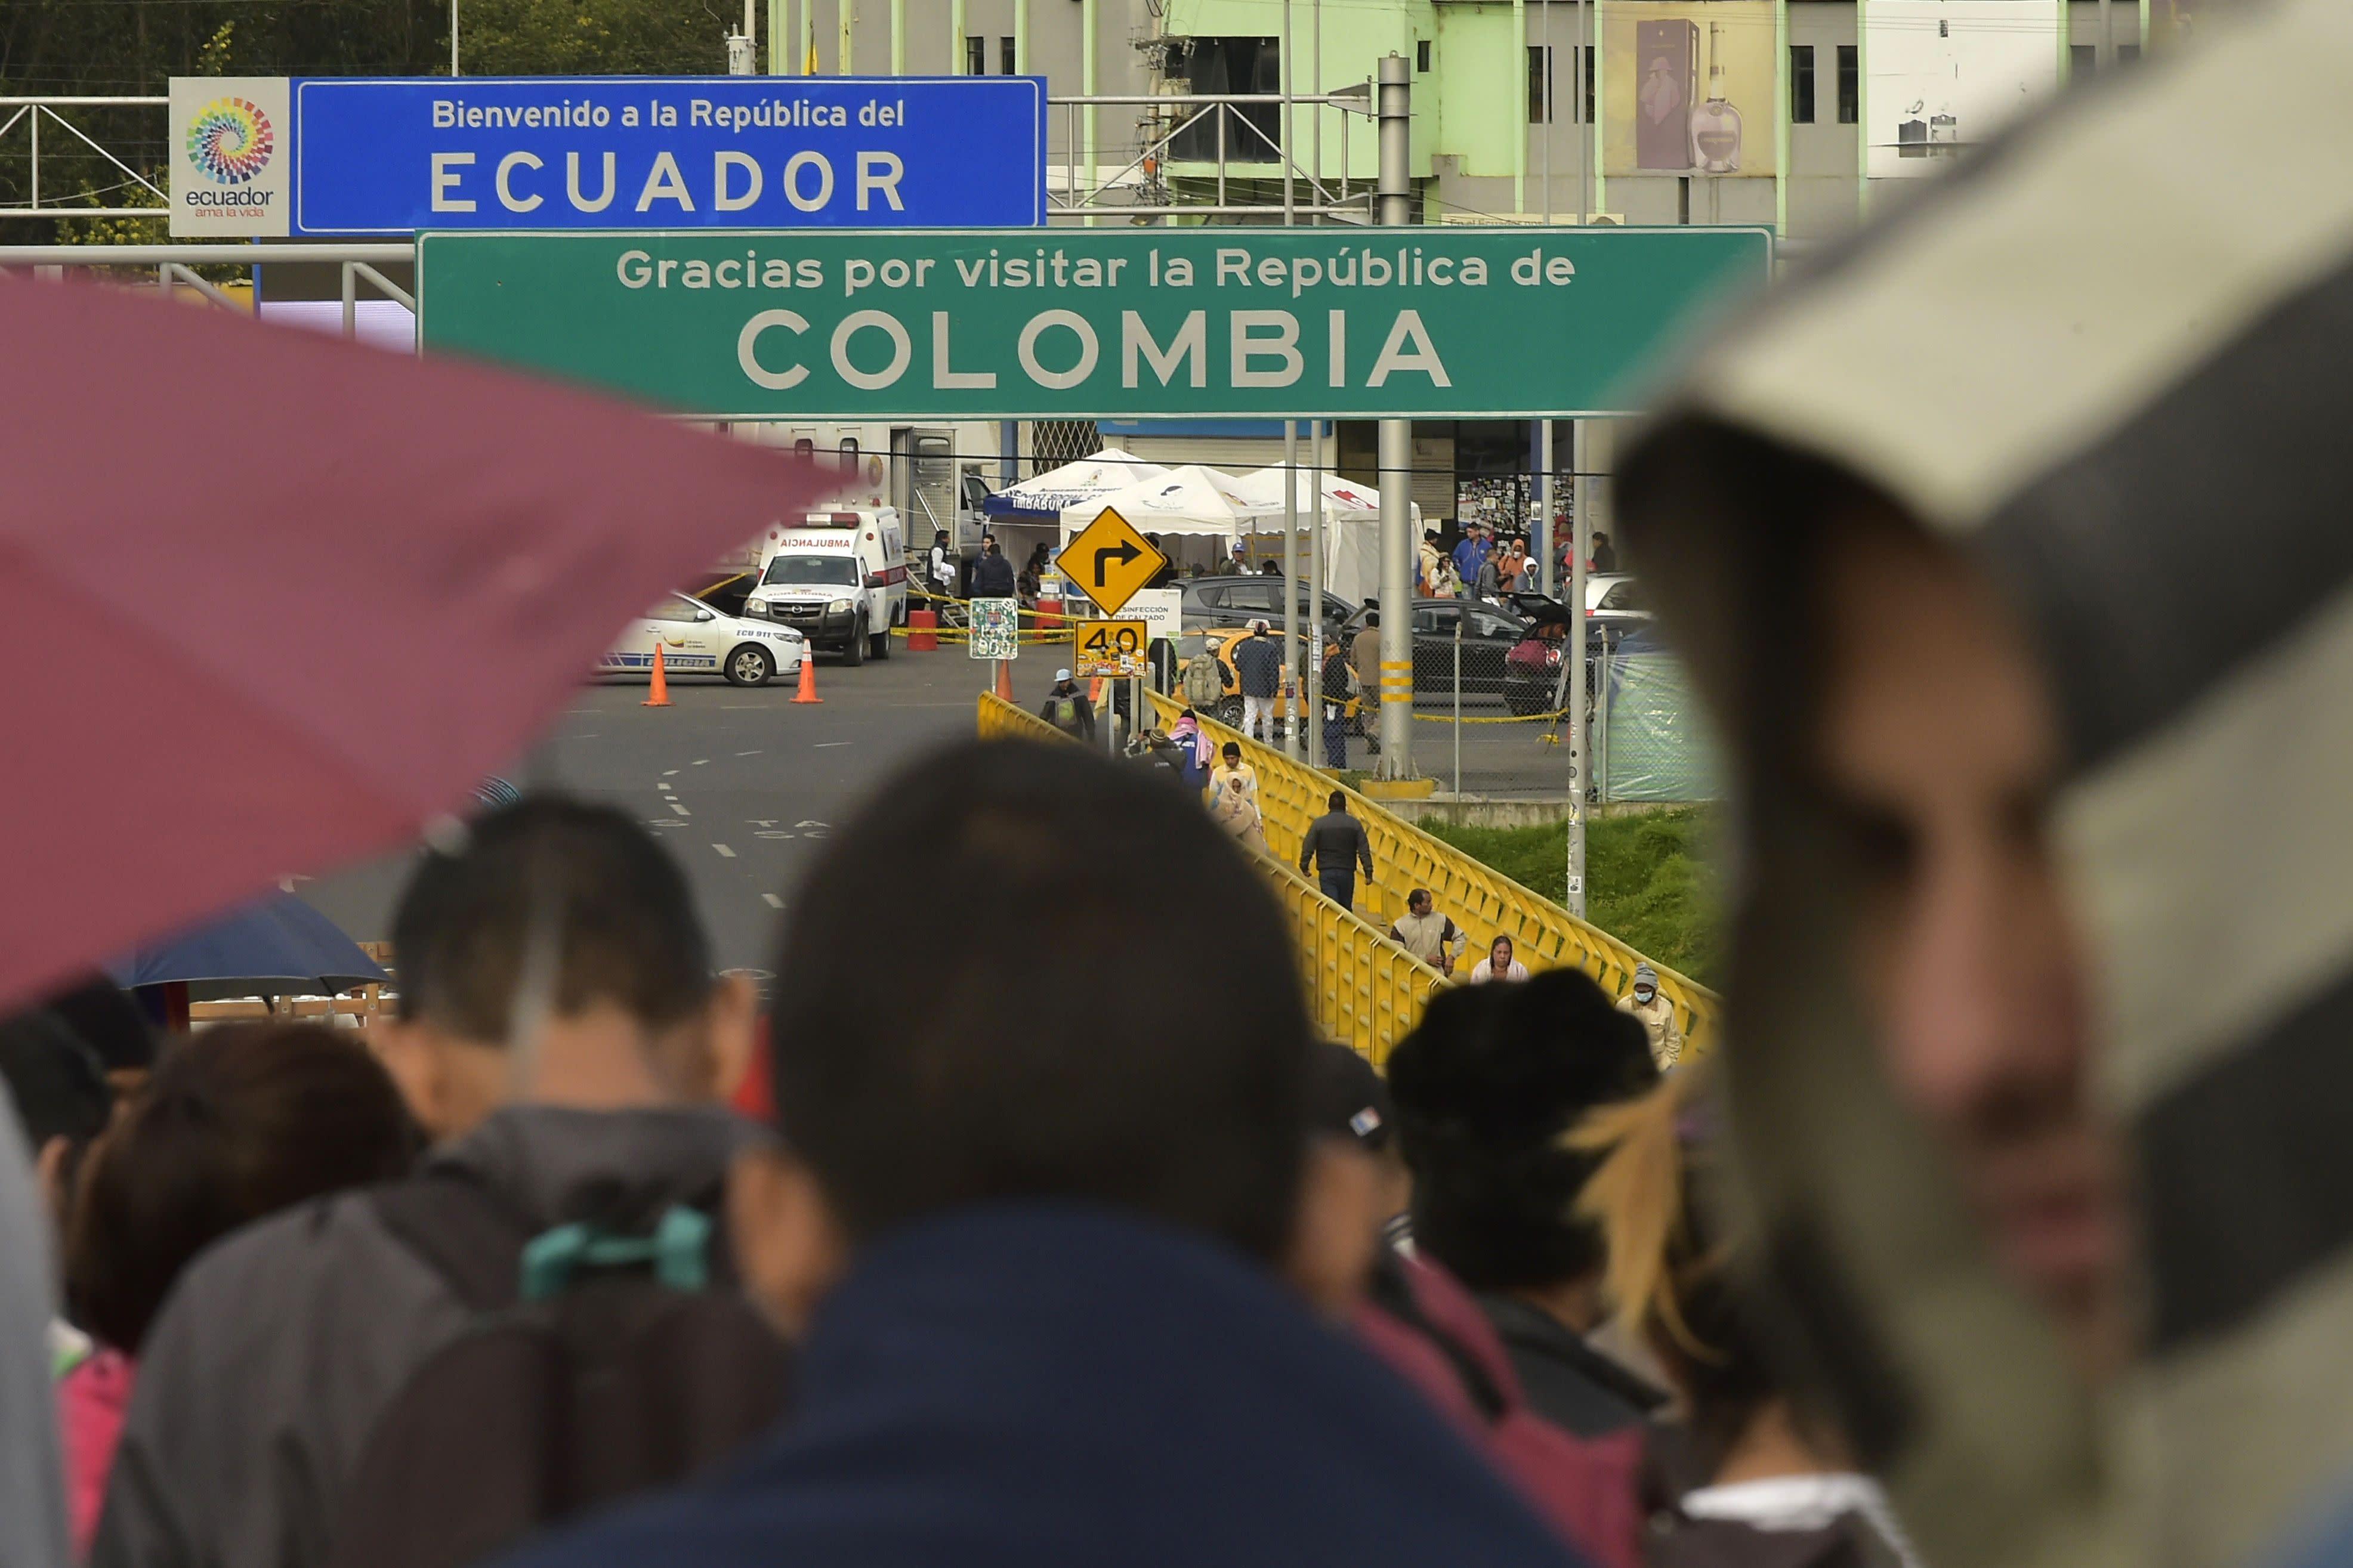 <p>Venezuelan citizens wait in line to cross to Ecuador at the Rumichaca international bridge in Ipiales, Colombia, on Aug. 11, 2018. (Photo: Rodrigo Buendia/AFP/Getty Images) </p>